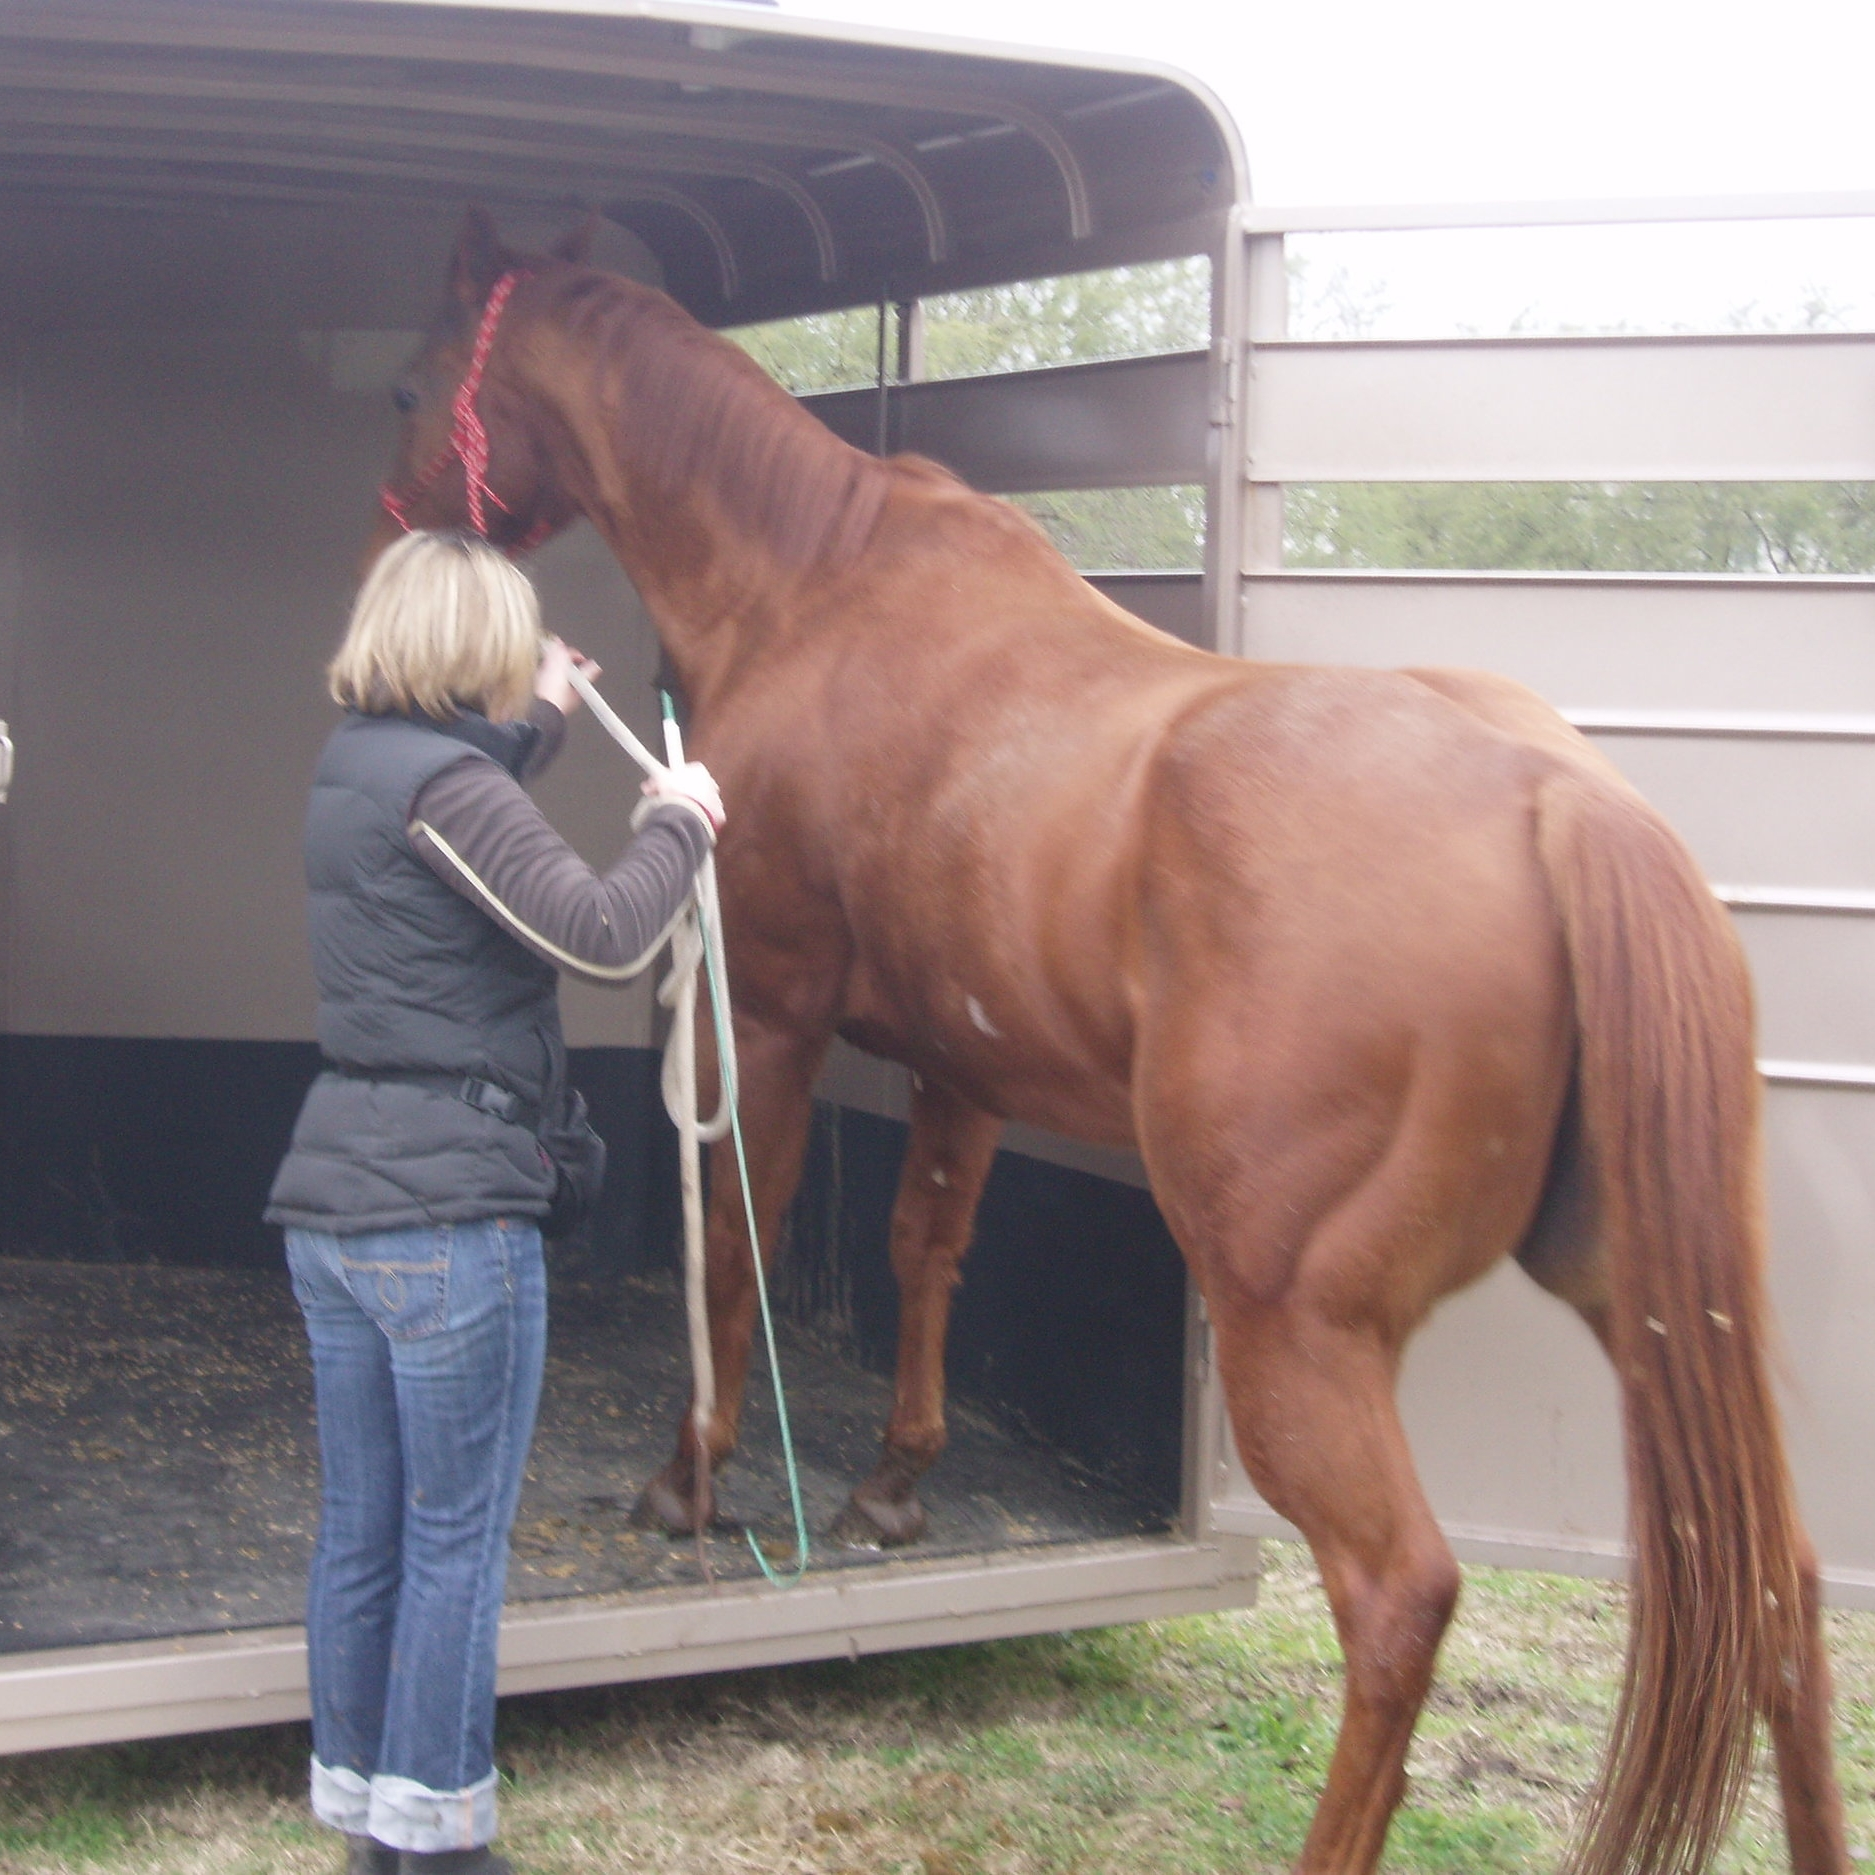 Bessie-horse behavior, horse body language, positive reinforcement, clicker training, crop hitting, lame horse, equine behavior problem.